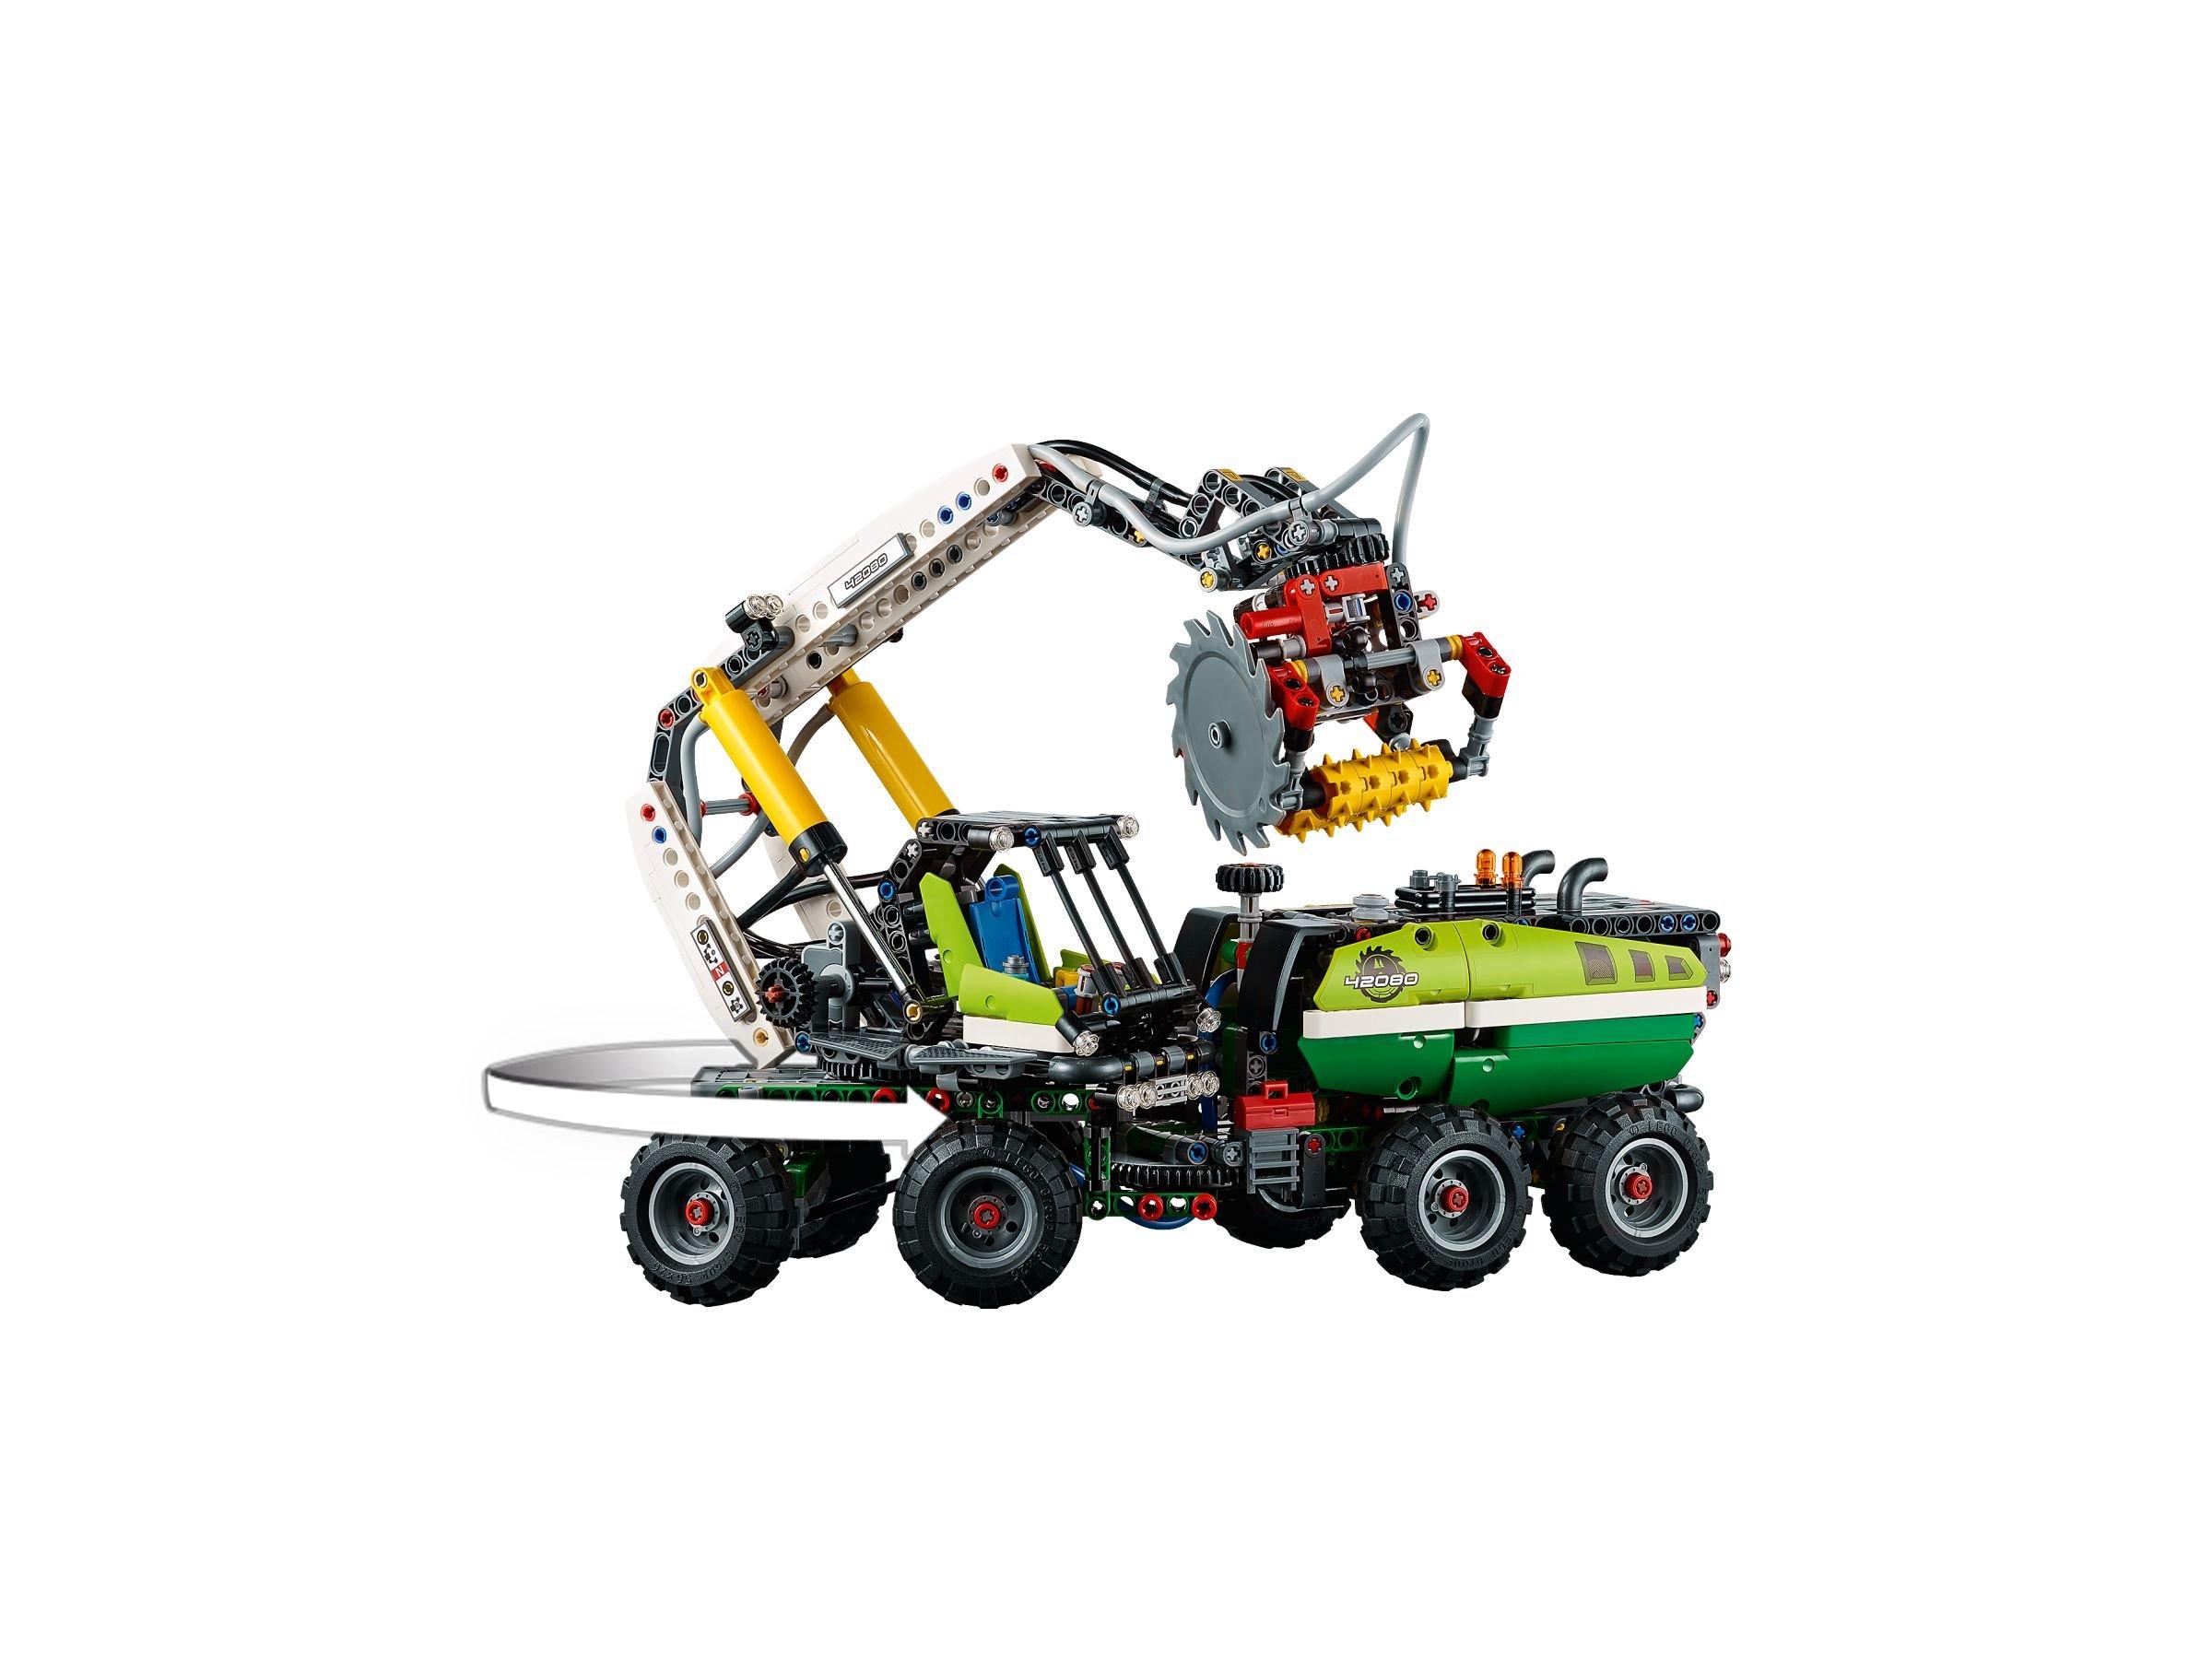 lego 42080 ab 96 99 25 gespart technic harvester forstmaschine im brickmerge preisvergleich. Black Bedroom Furniture Sets. Home Design Ideas